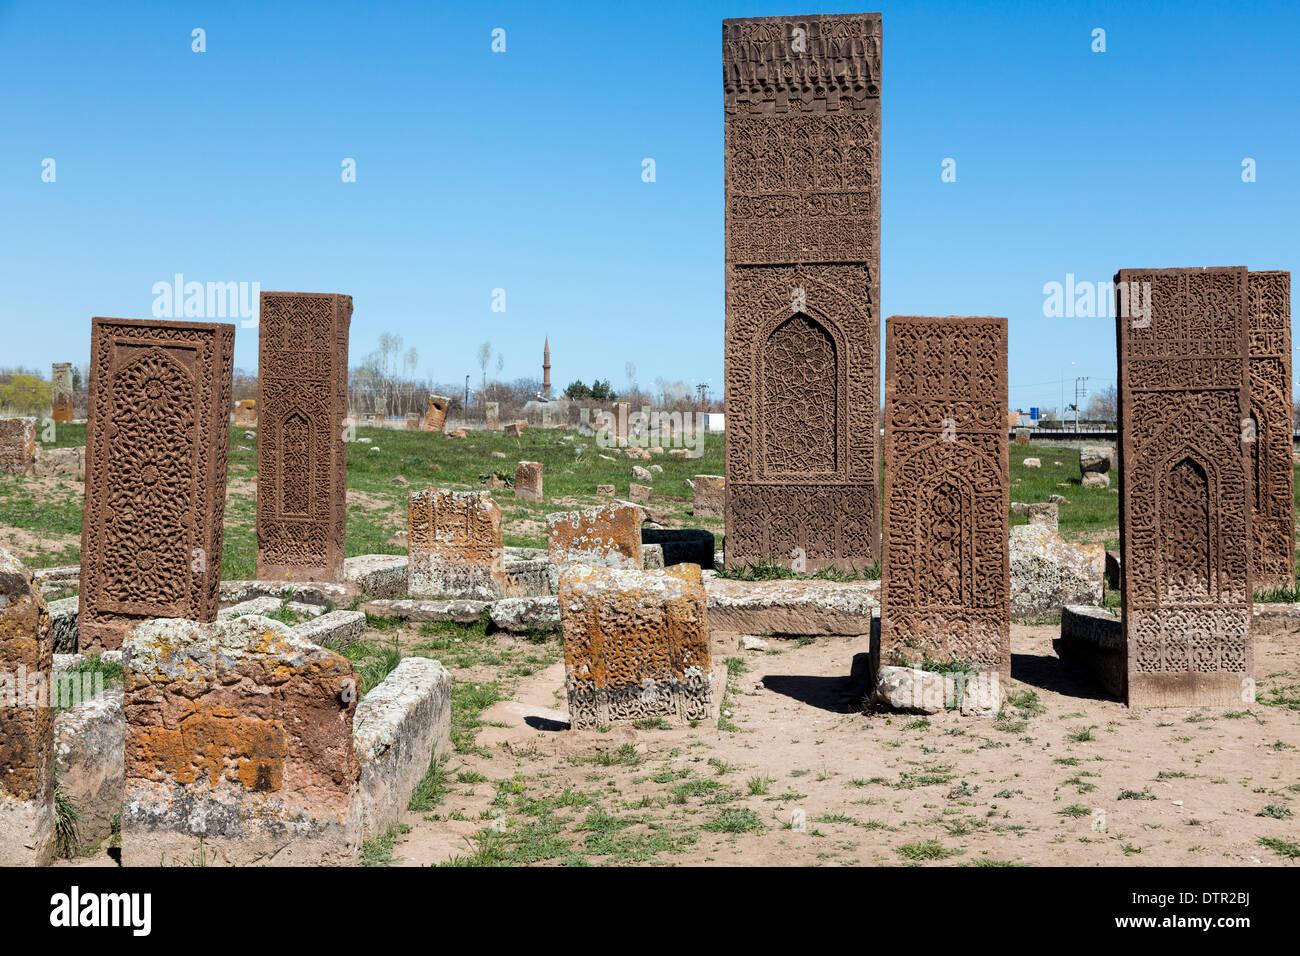 carved stone tombstones, Ahlat, Bitlis Province, Eastern Anatolia Region, Turkey - Stock Image